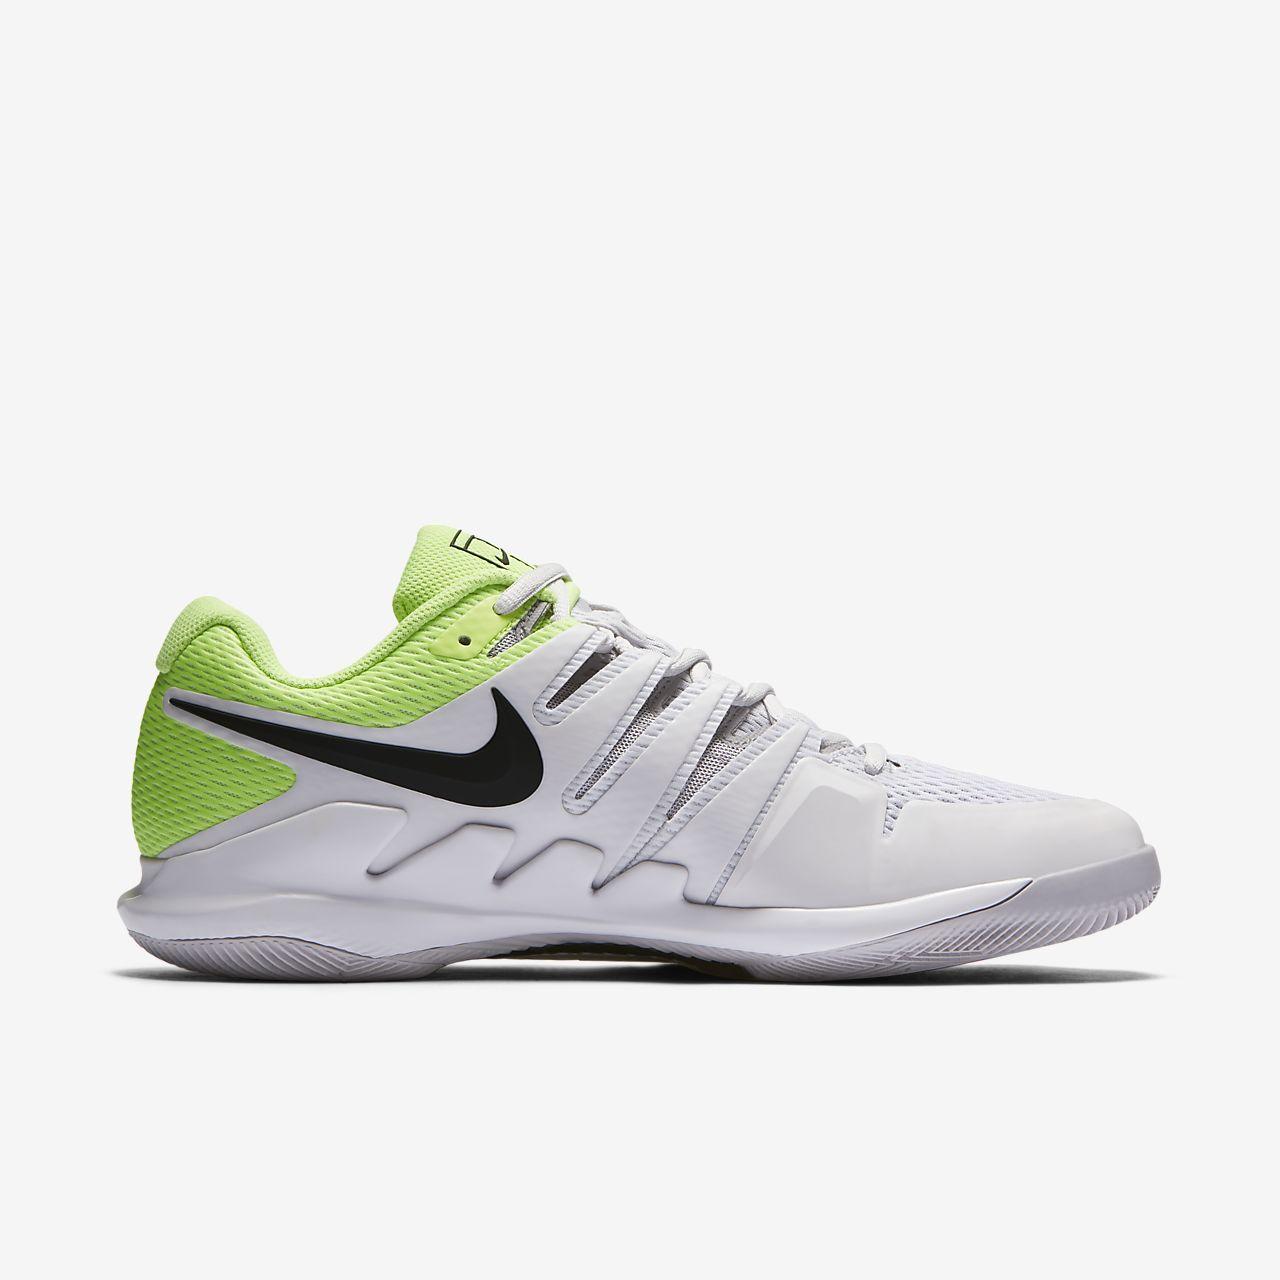 chaussure nike de tennis